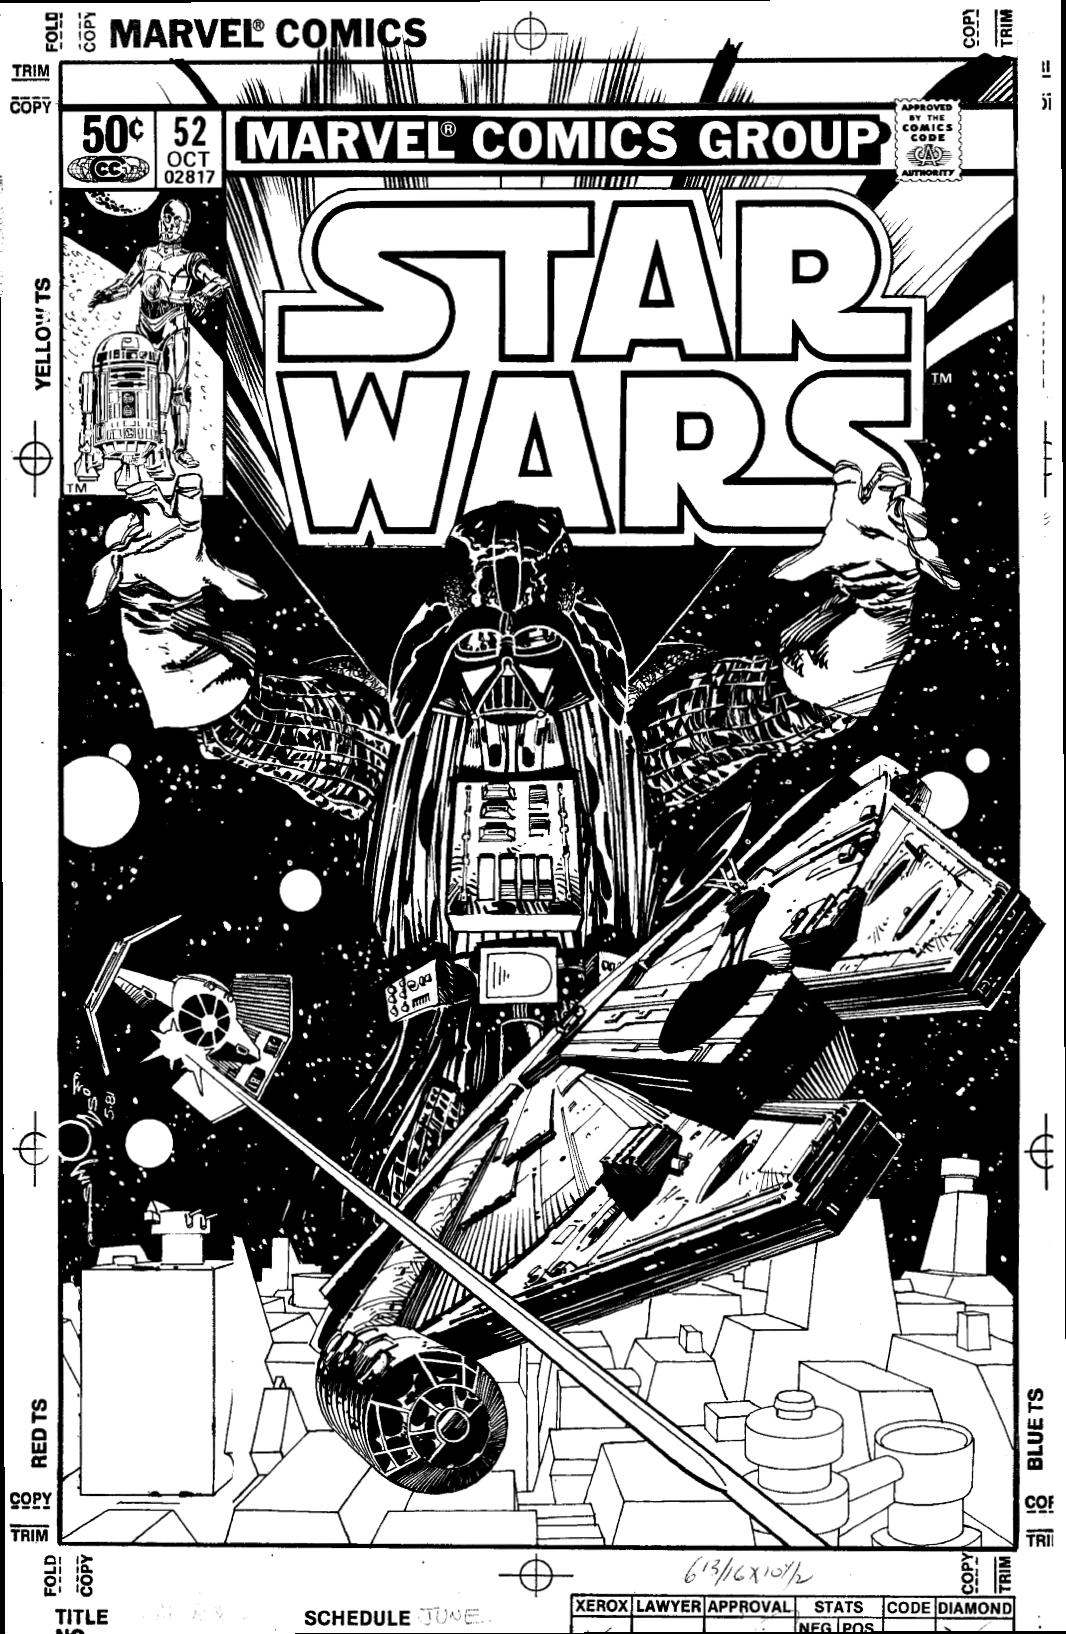 Star Wars, por Walter Simonson